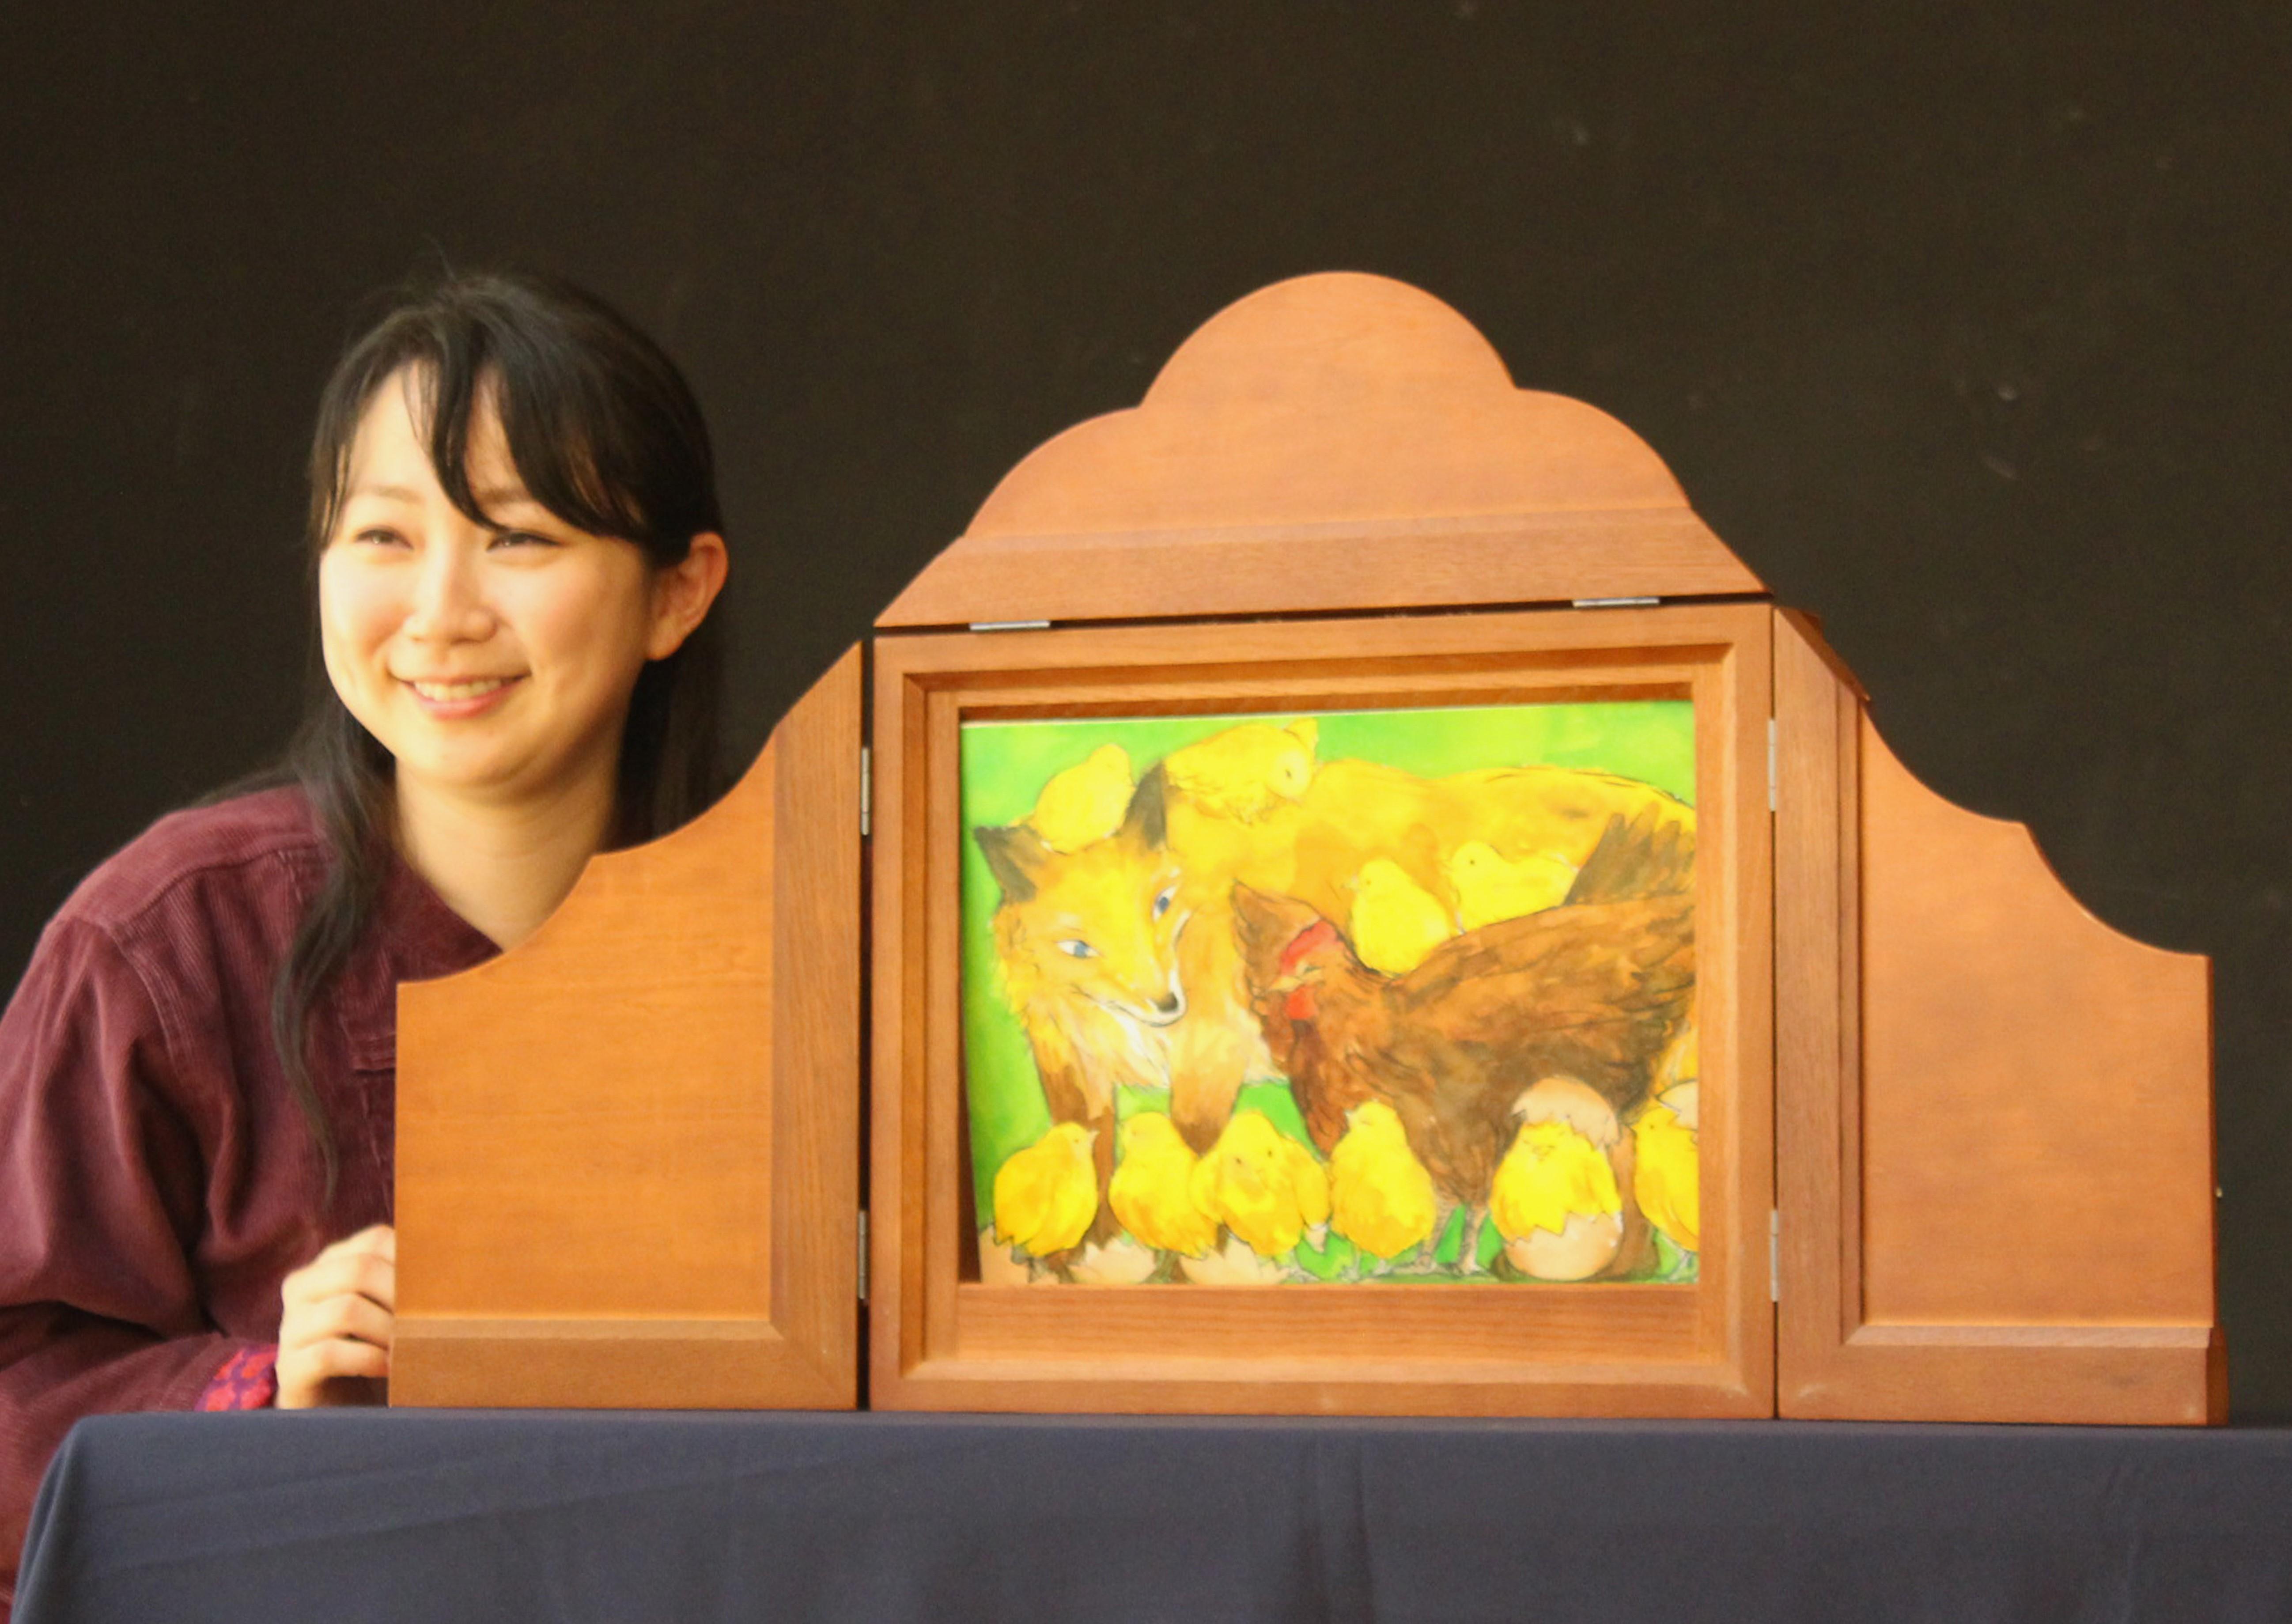 Petites histoires du Kamishibai